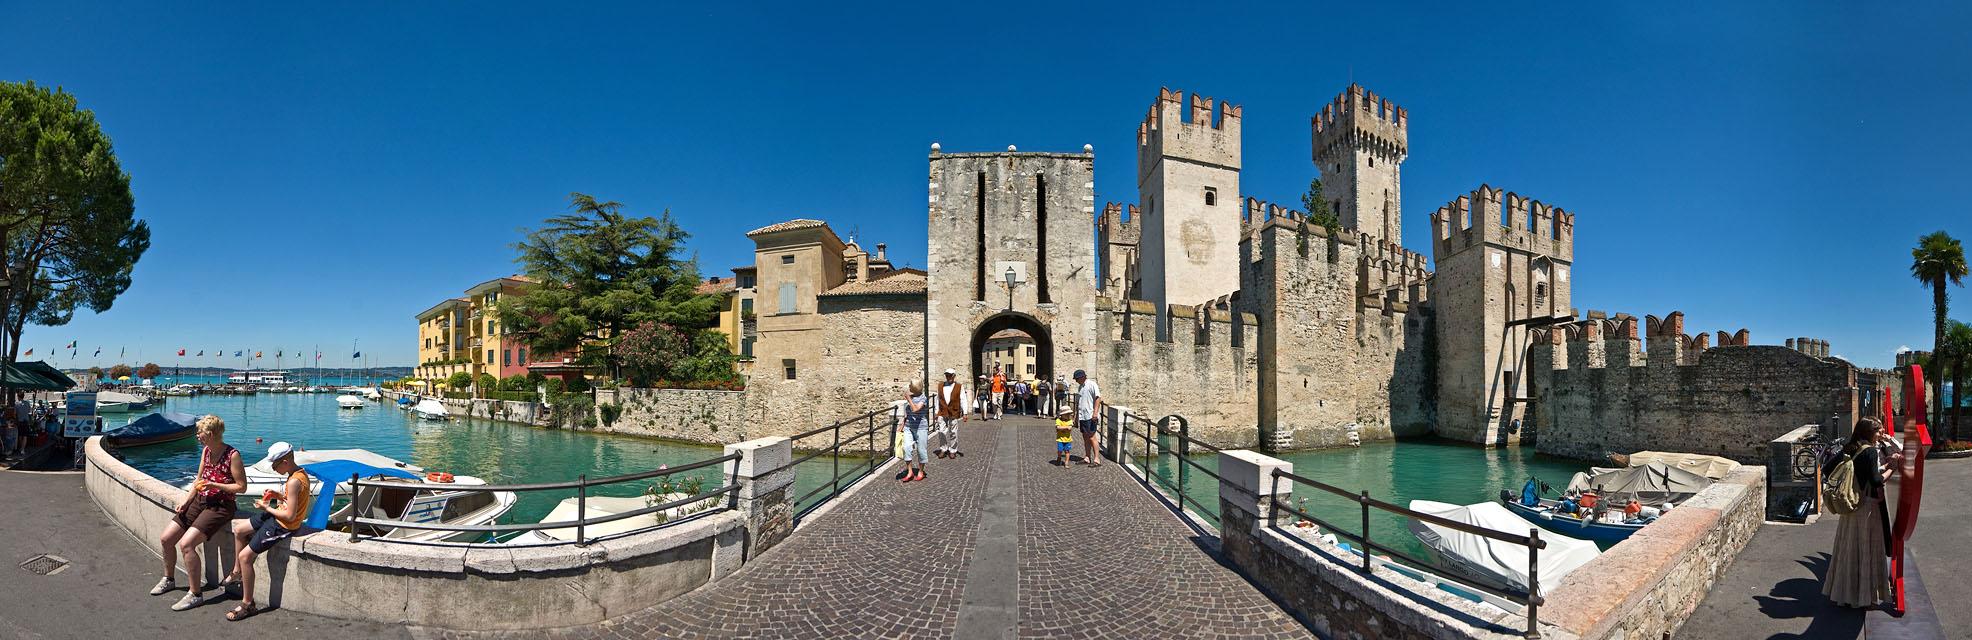 Sirmione castle - Castello Scaligero - from outside